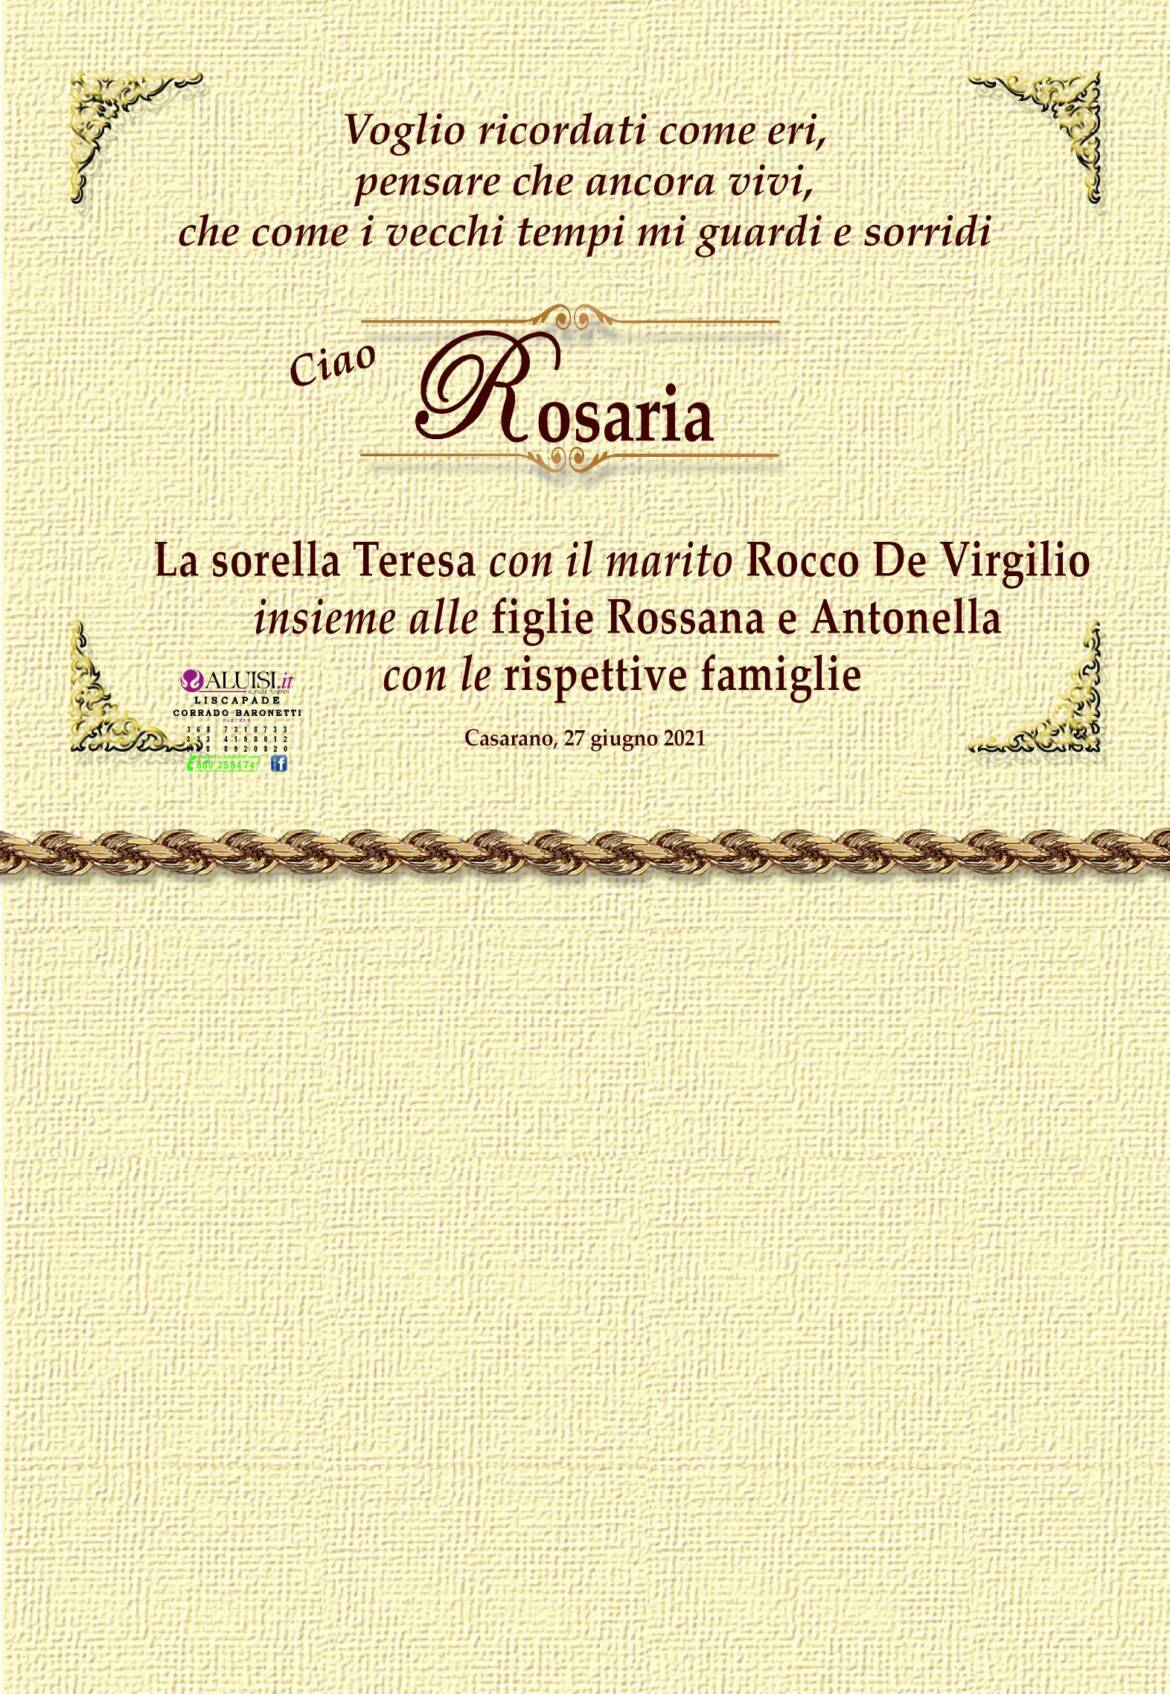 partceipazioni-rosaria-casarano-1.jpg